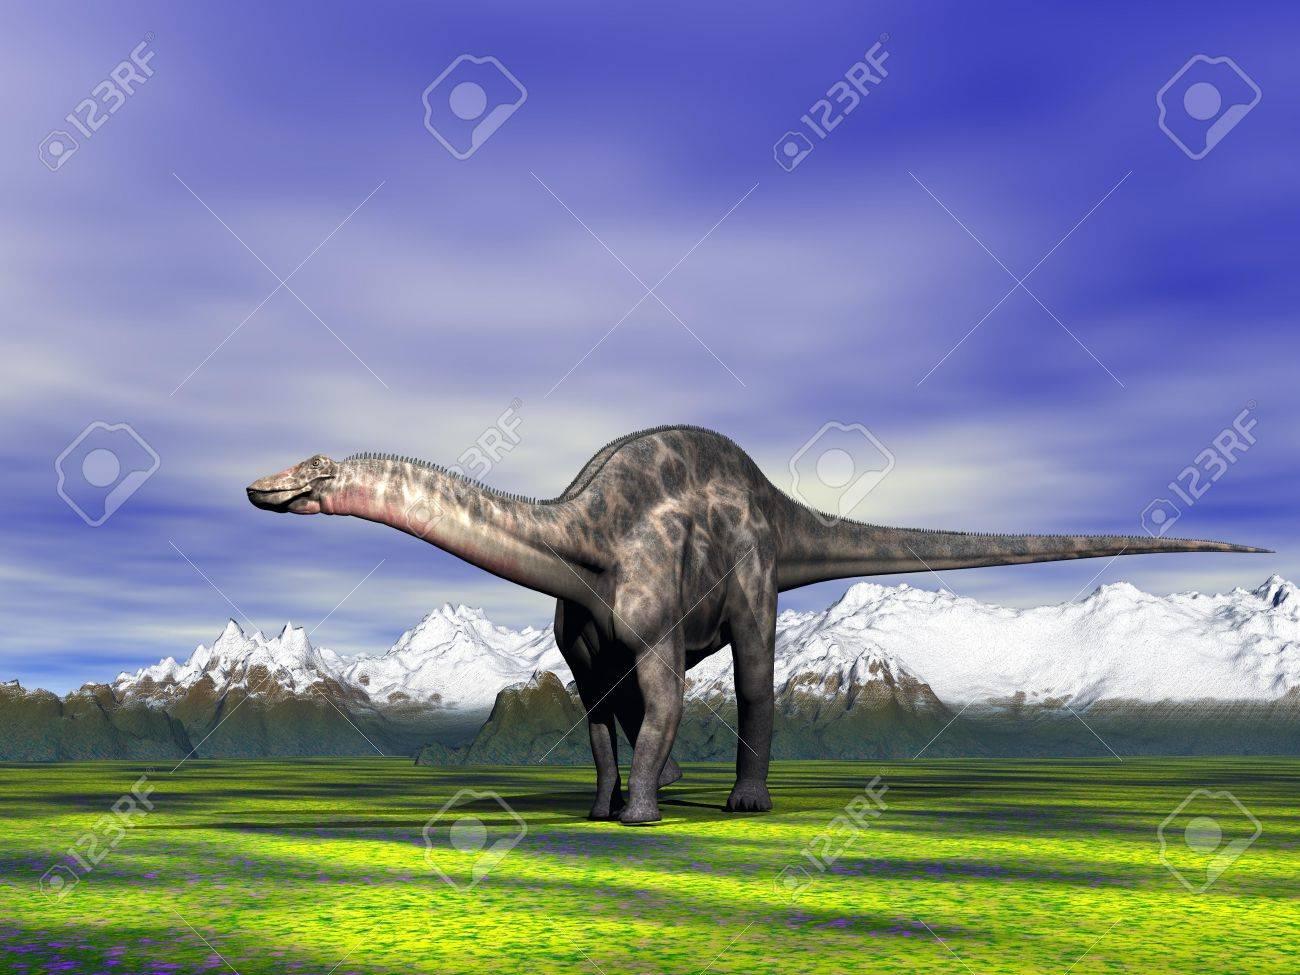 dino Dicraeosaurus and mountain and snow - 19423679